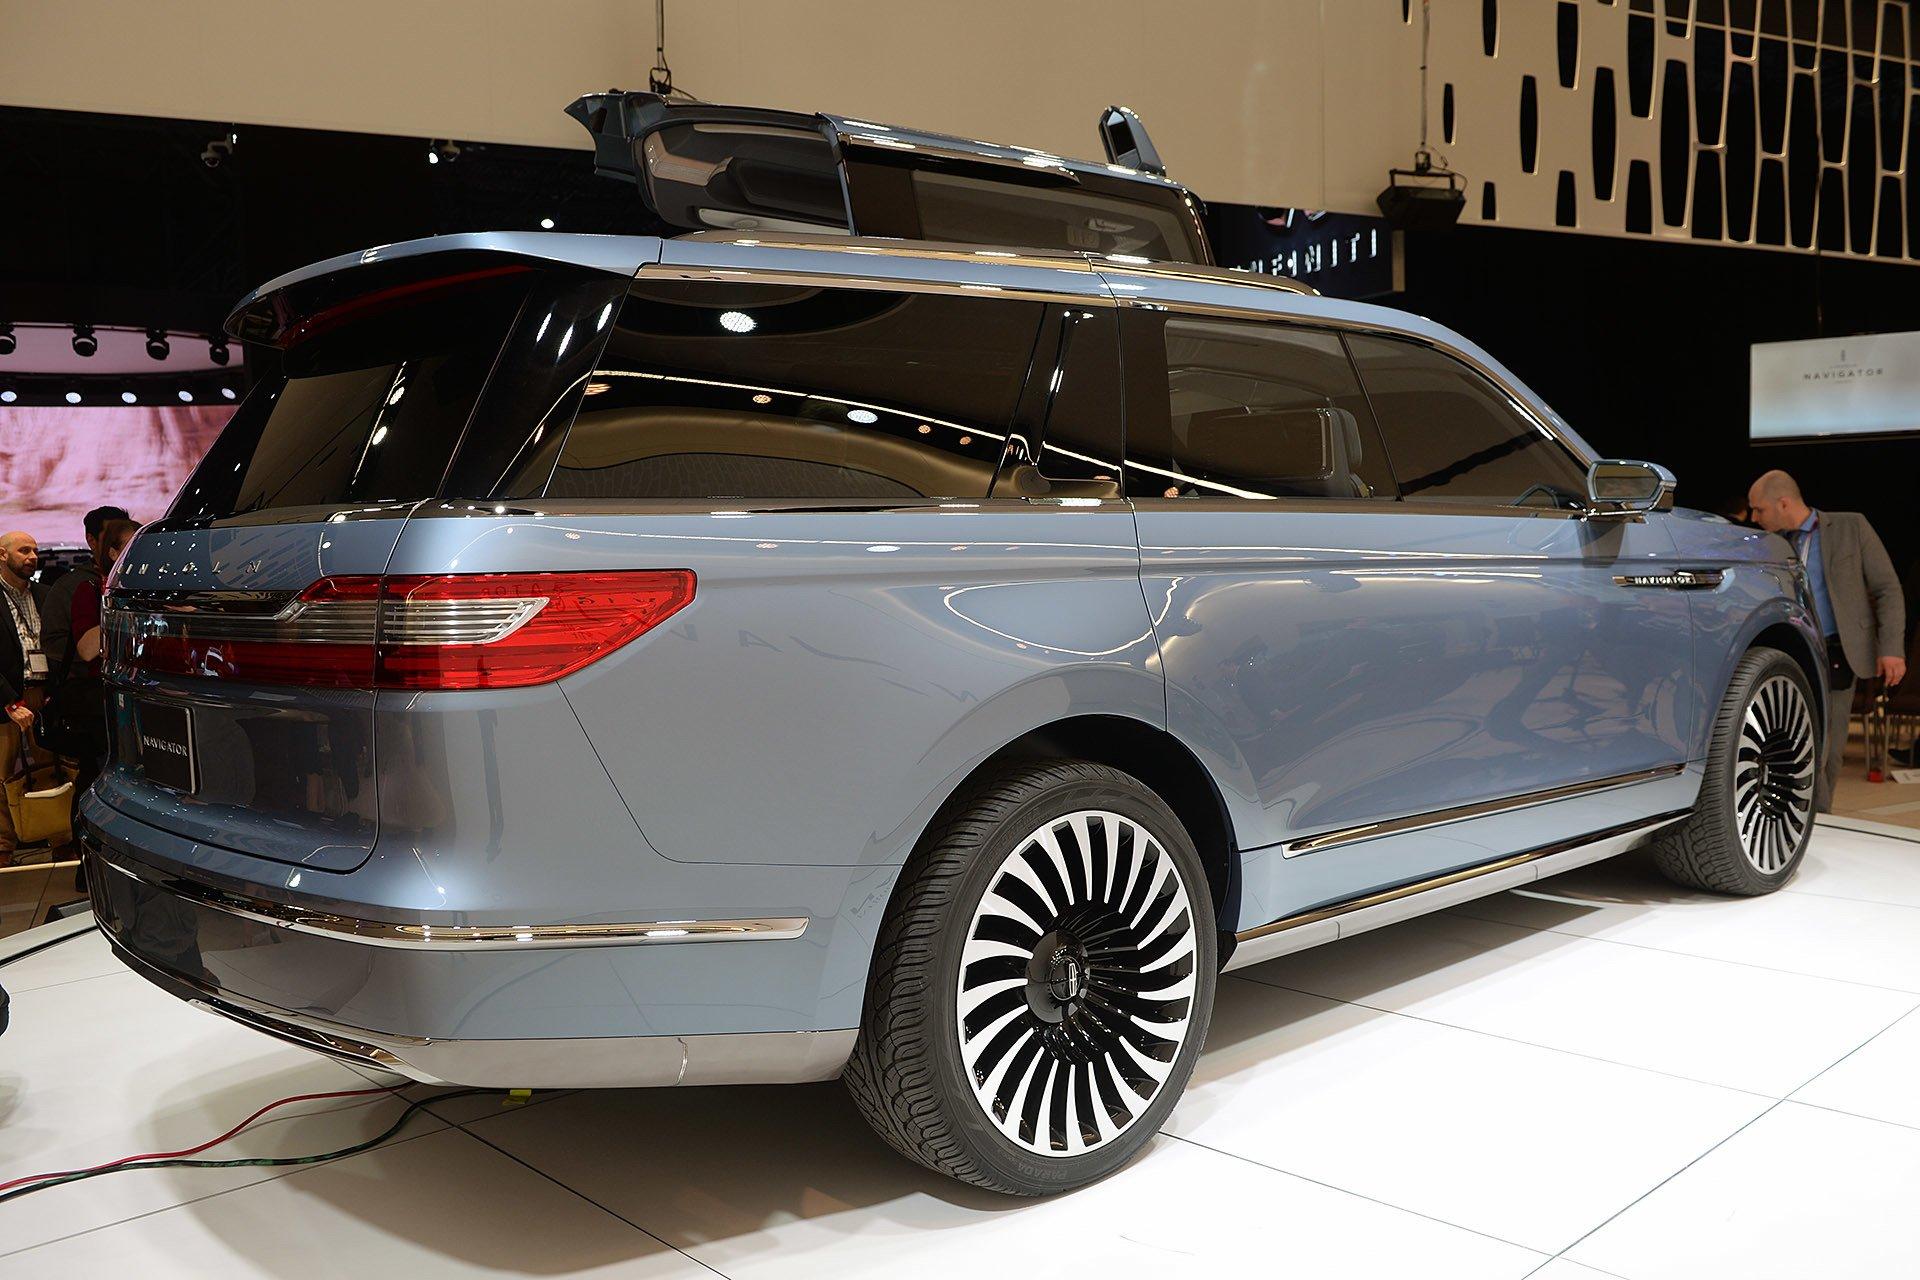 new york auto shows 2016 cars lincoln navigator concept. Black Bedroom Furniture Sets. Home Design Ideas